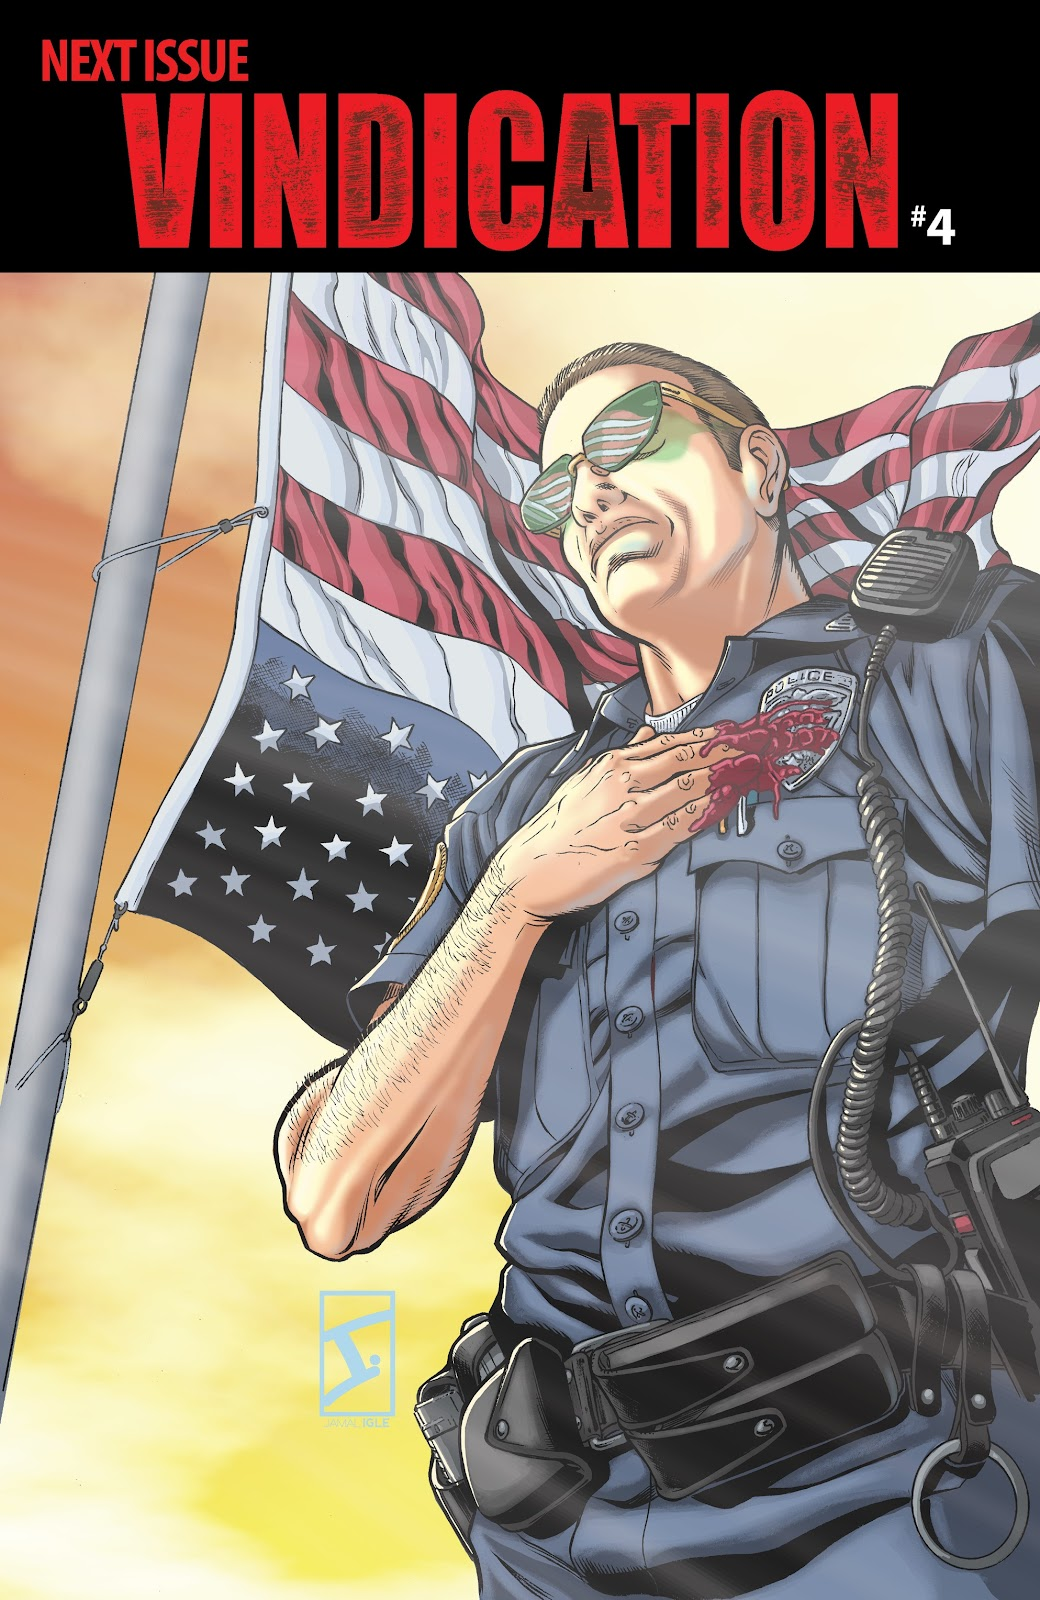 Read online Vindication comic -  Issue #3 - 25